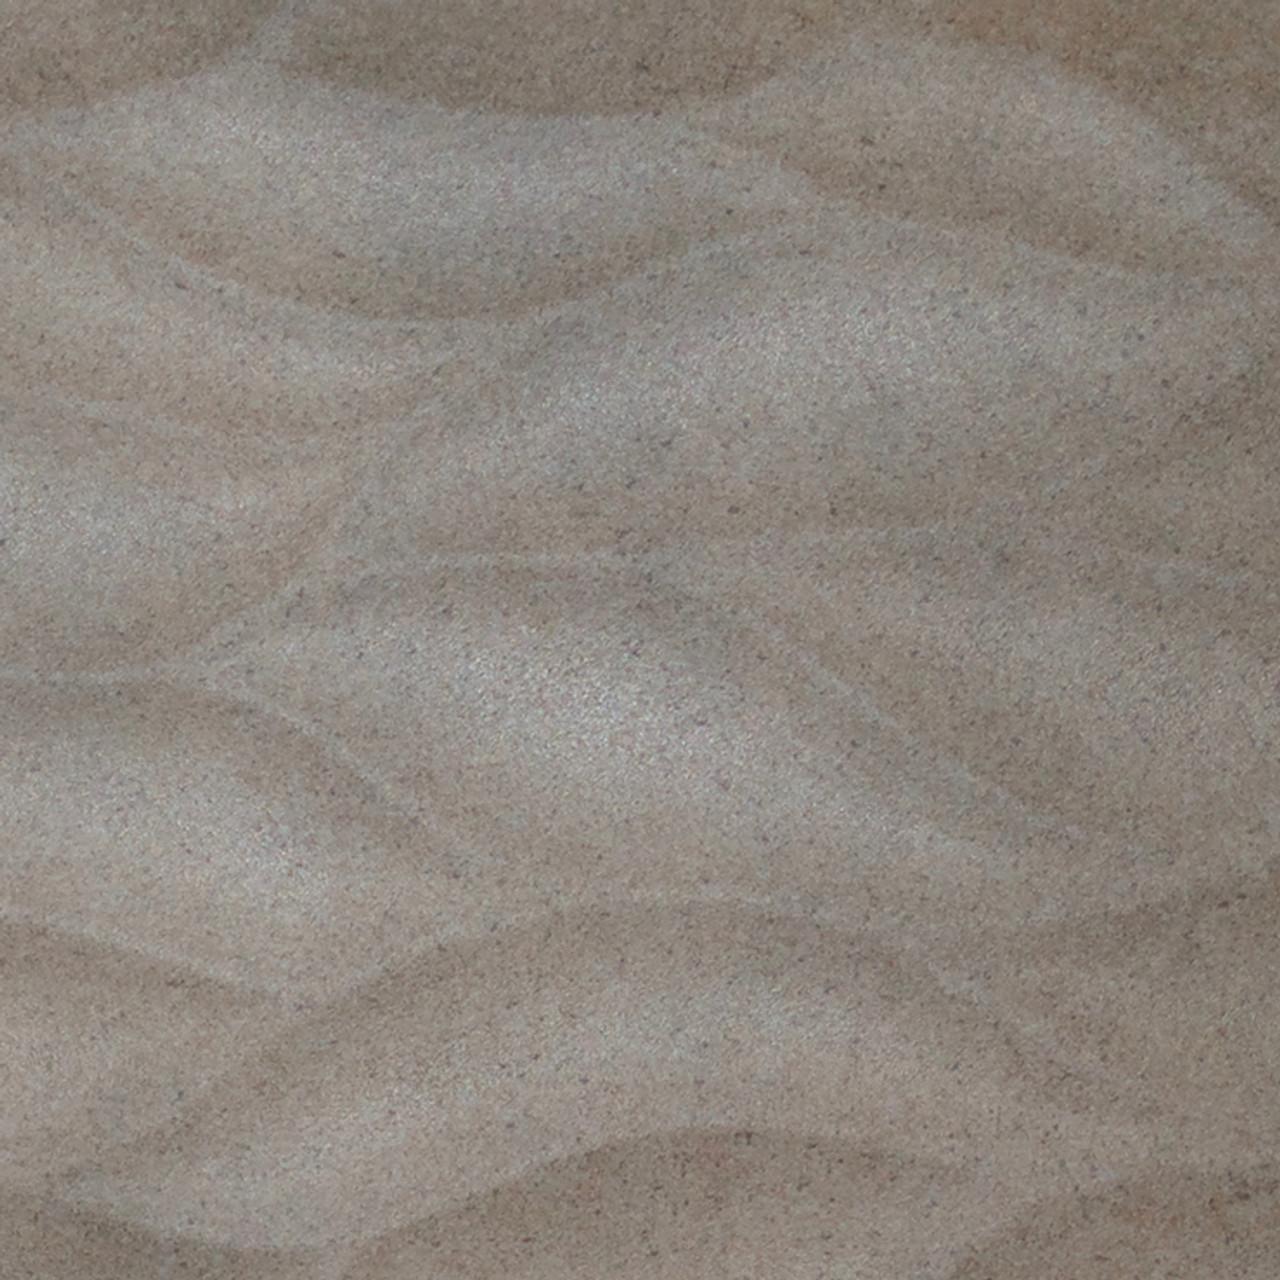 clearance jet onda beige wave ceramic wall tiles 6 78 sqm